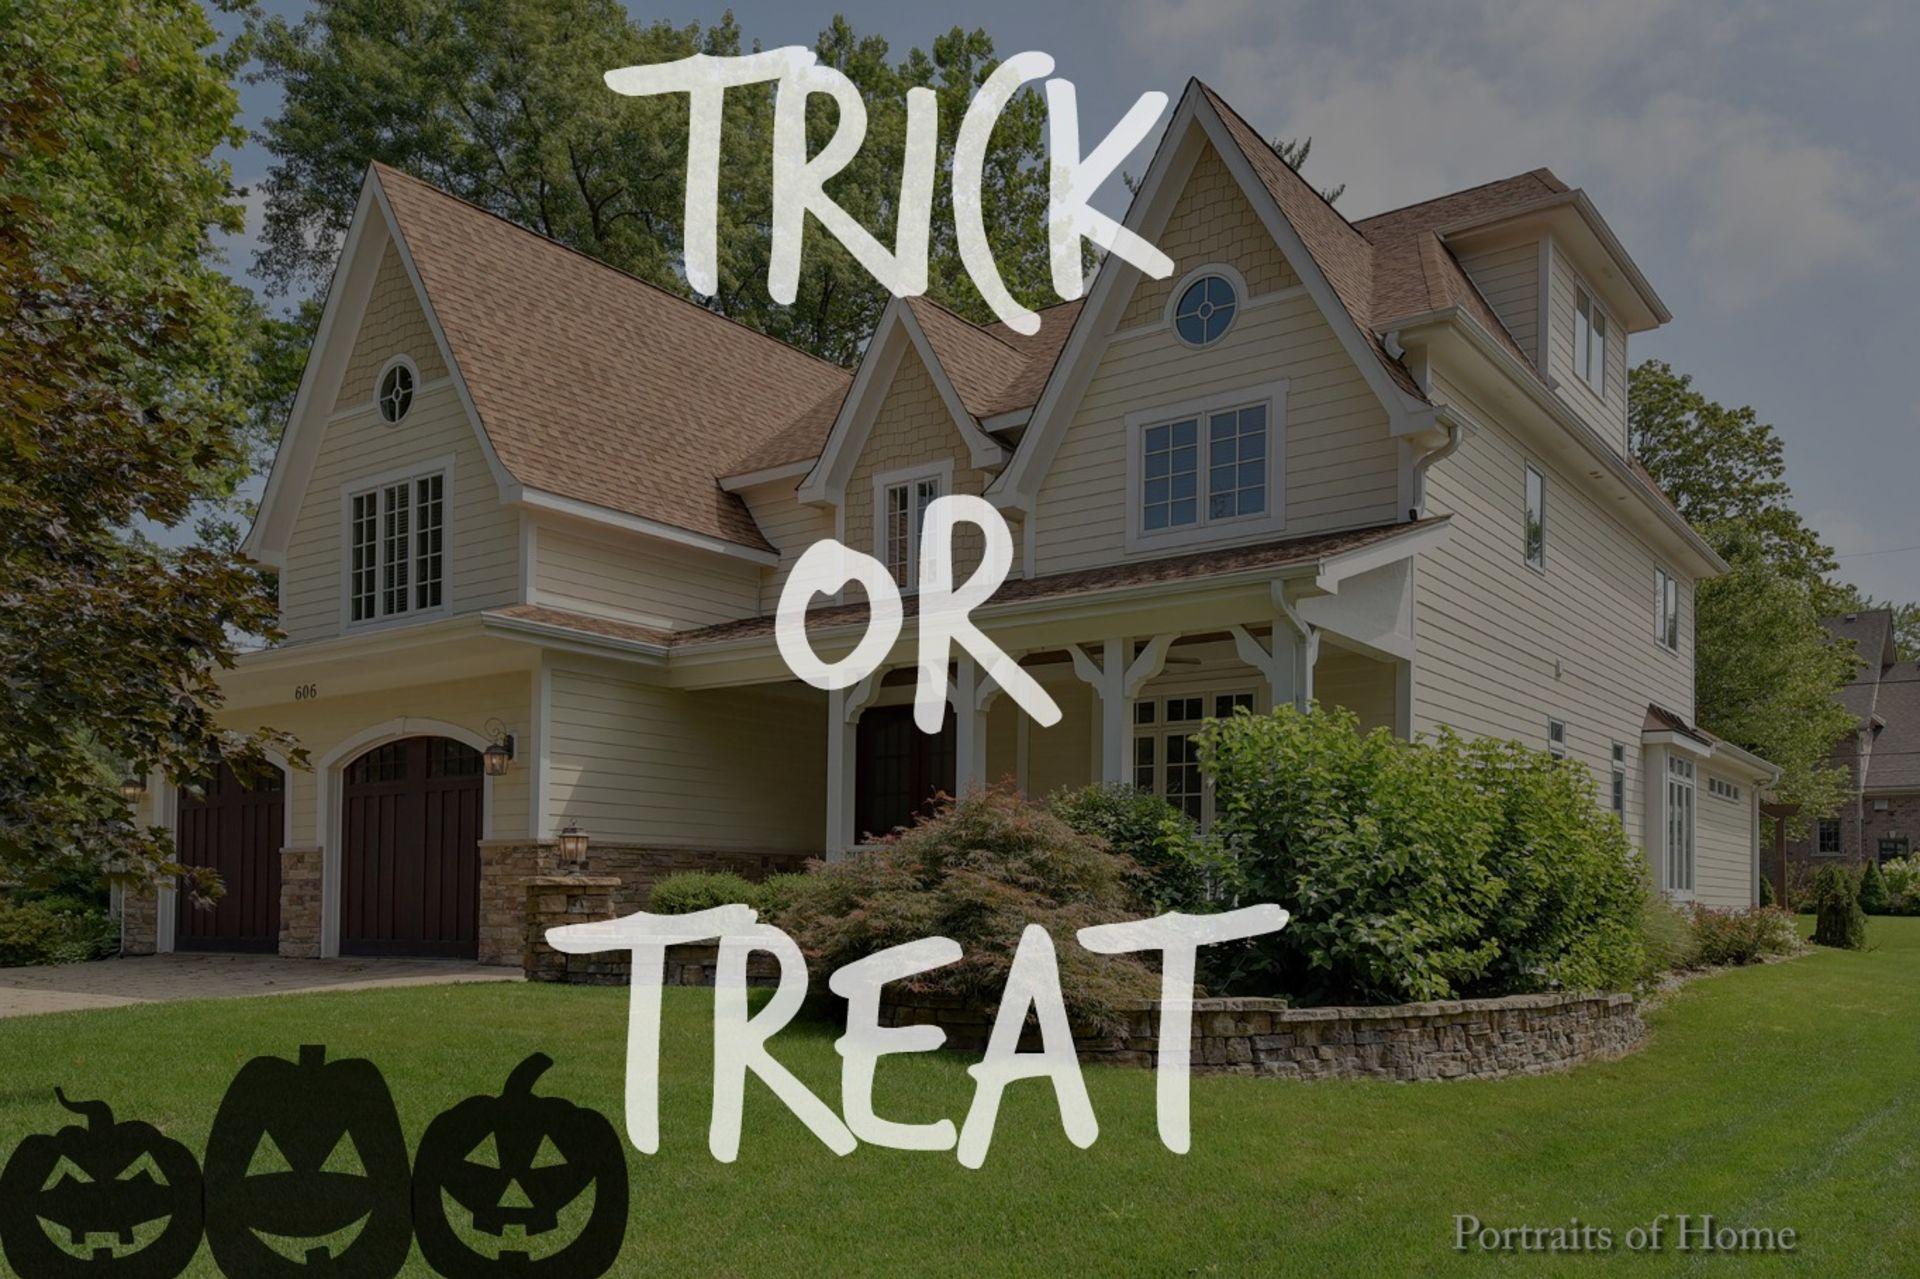 Halloween House: Trick or Treat